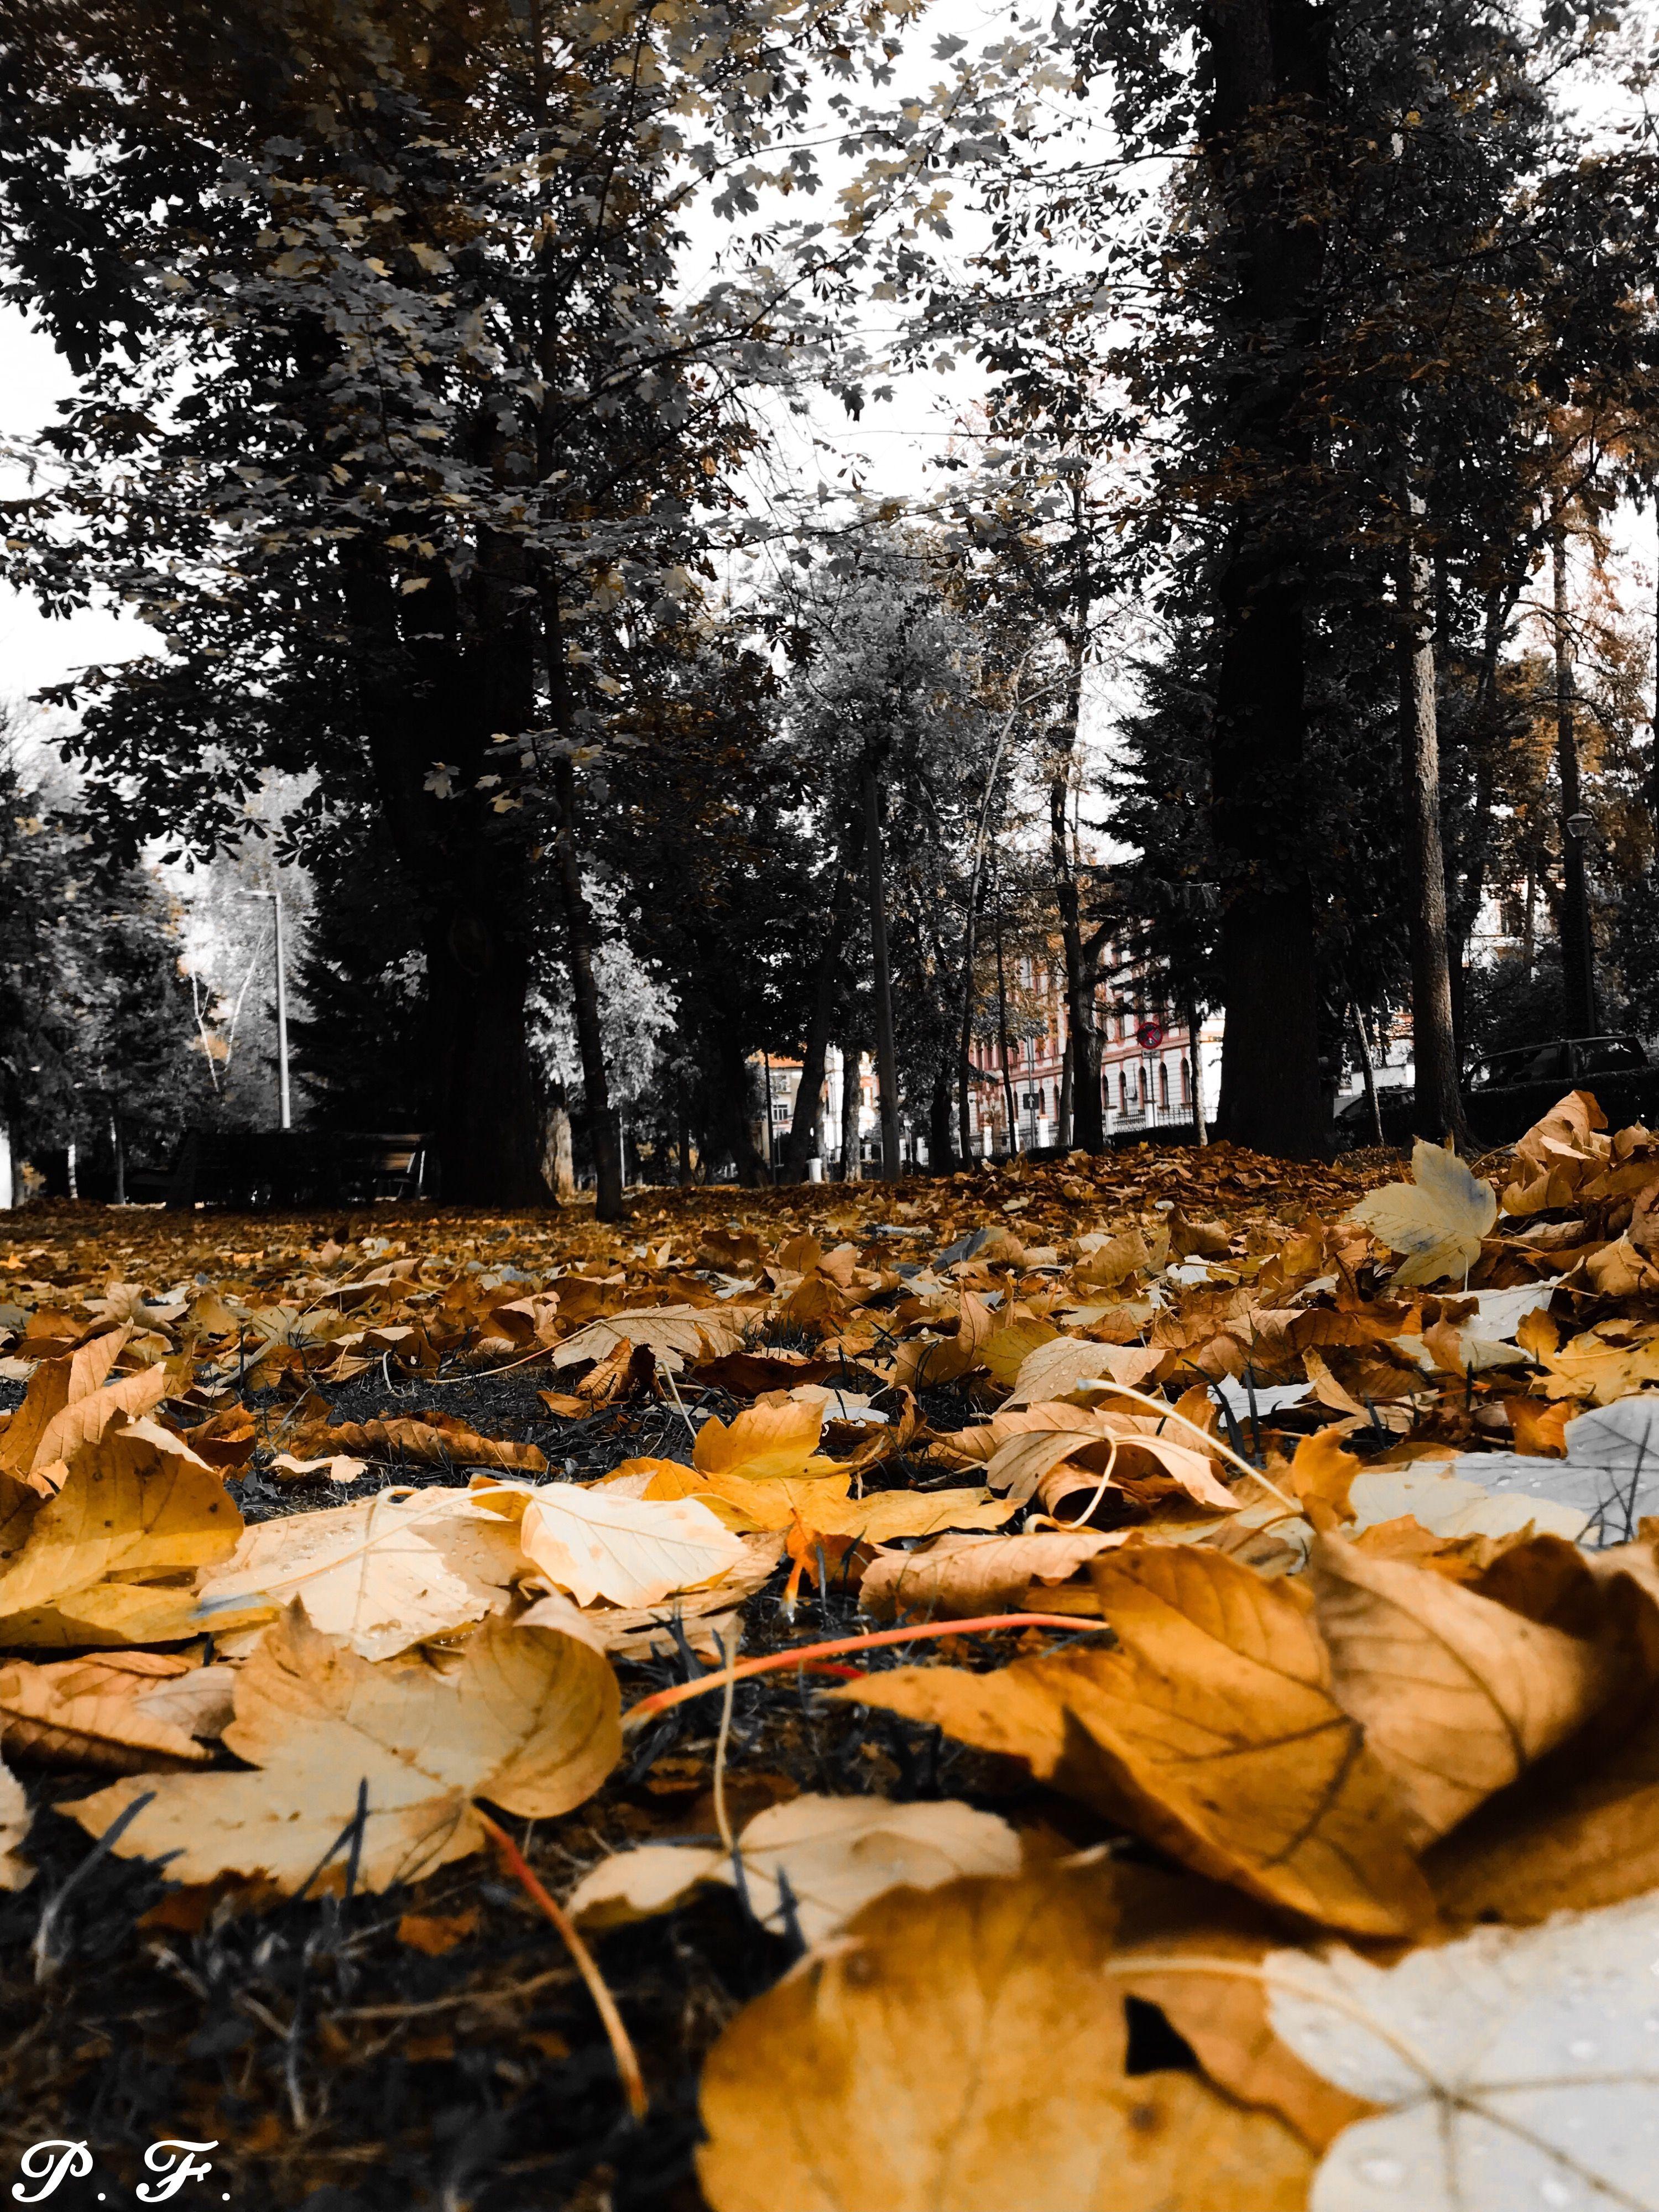 Autumn - orange and black #autumnleavesfalling